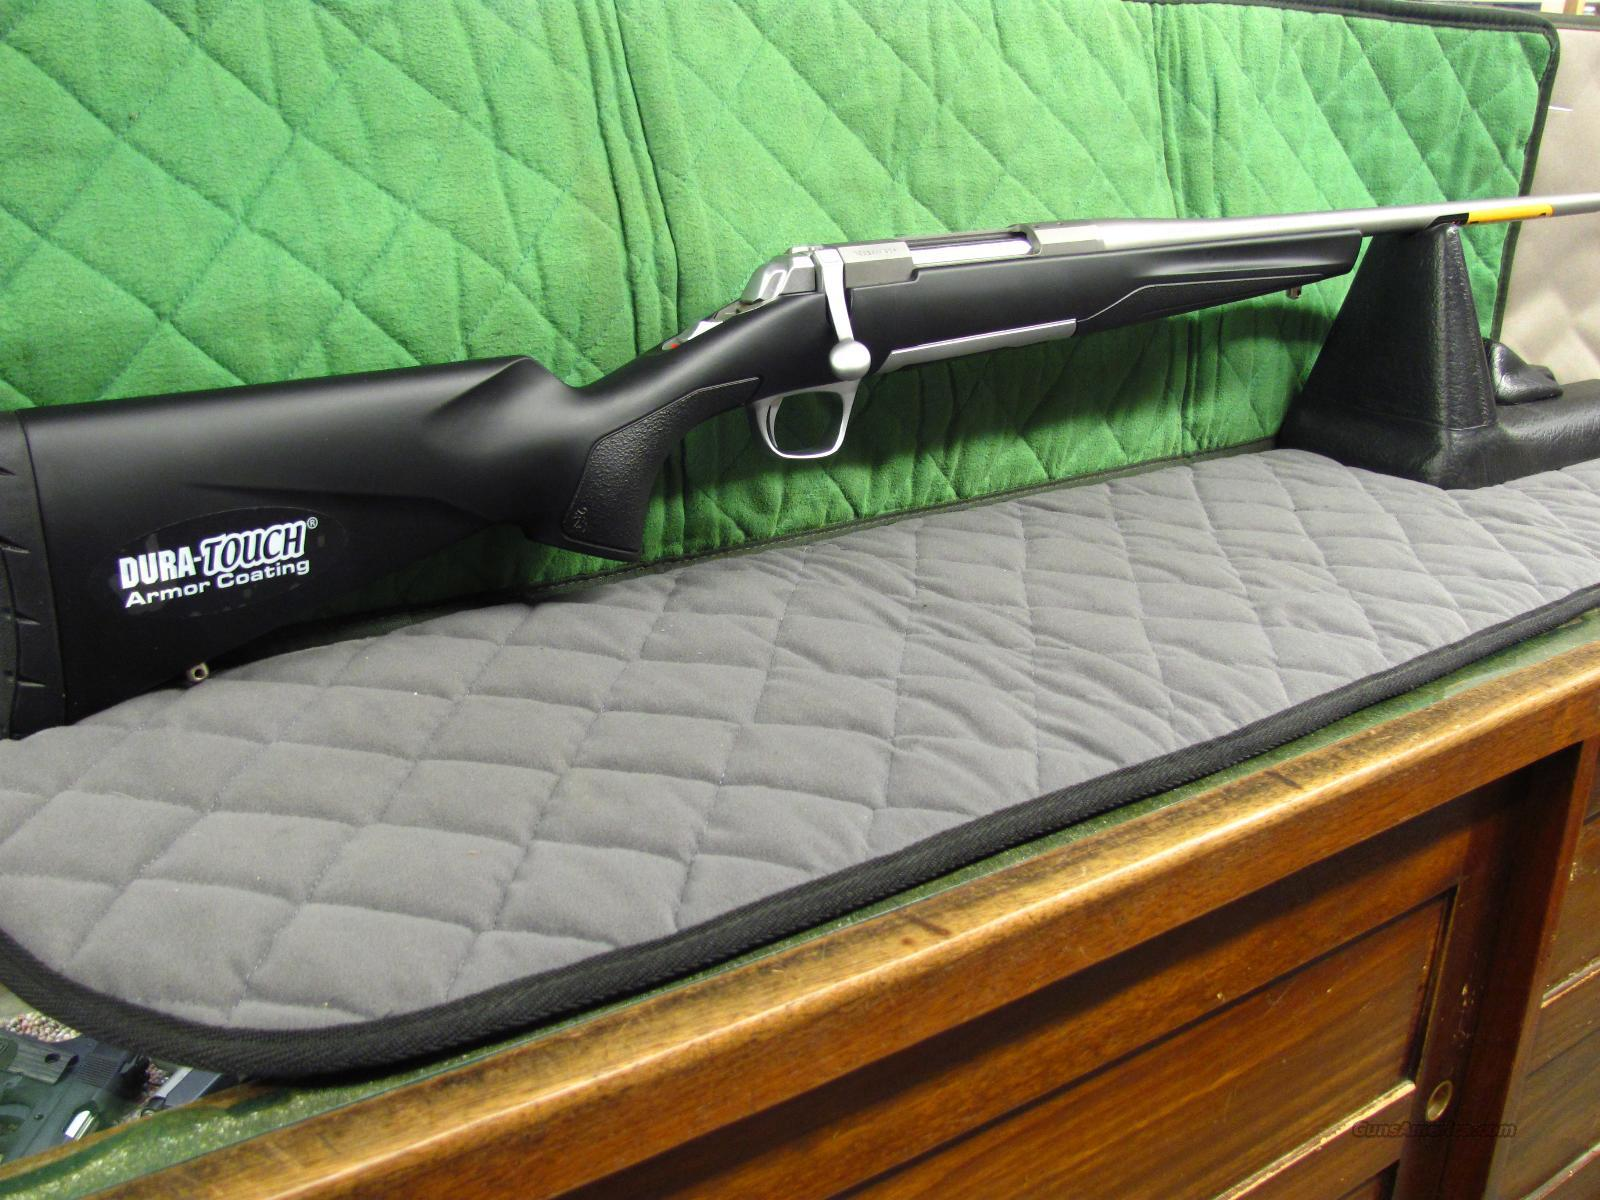 Browning X-Bolt Stainless Stalker 270 Win  **NEW** 035202224  Guns > Rifles > Browning Rifles > Bolt Action > Hunting > Stainless